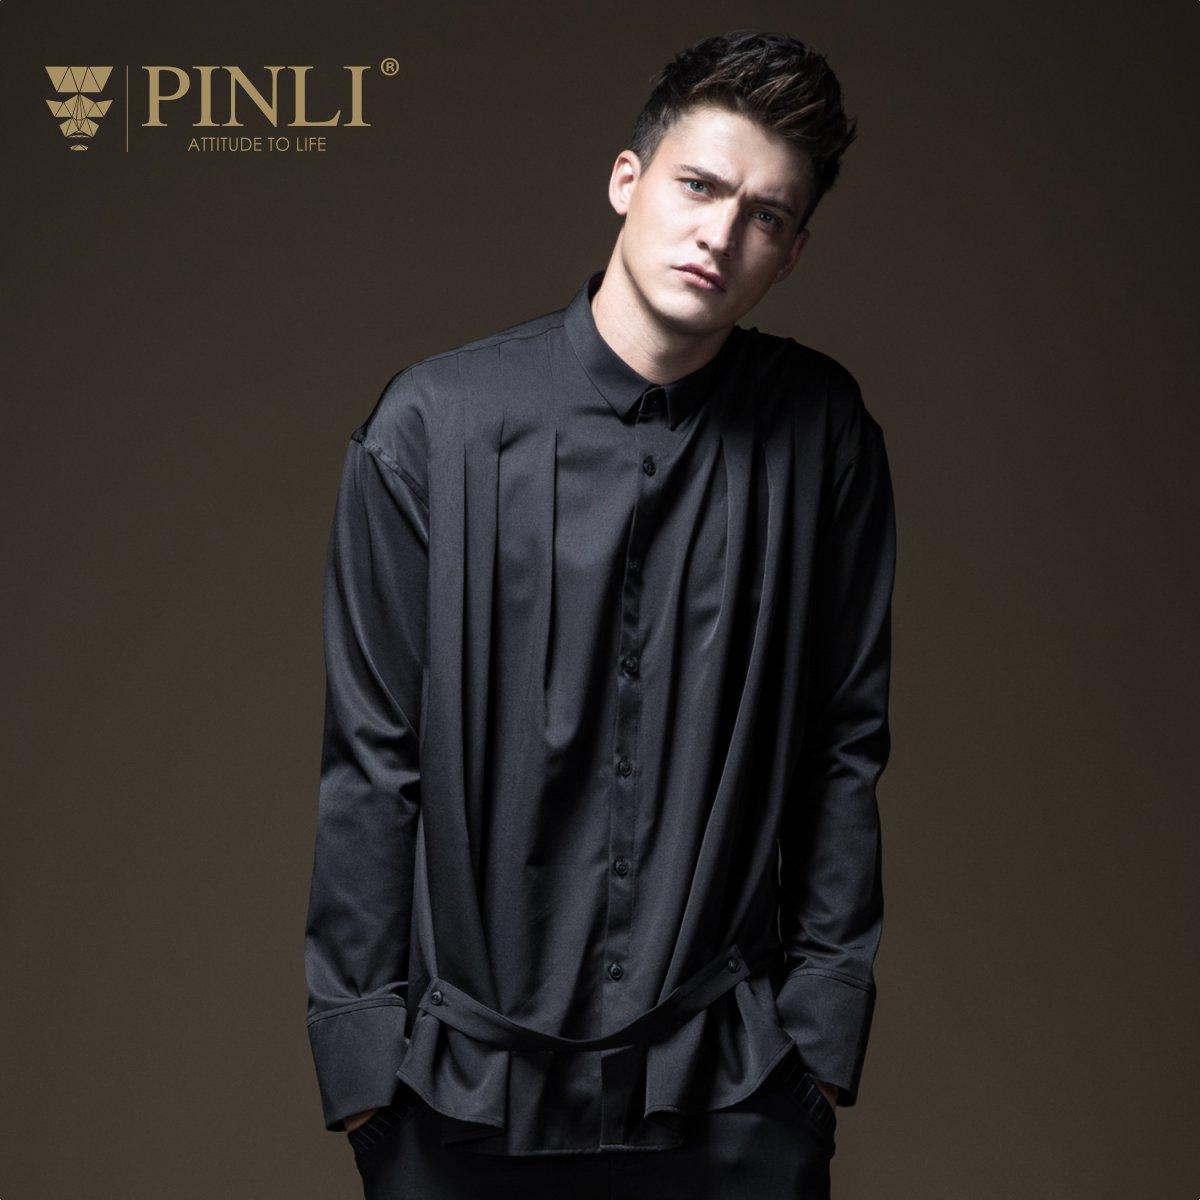 Hawaiian Shirt Promotion Pinli Pin Li 2018 Autumn New Men's Bottoming, Pleated Pure Color Casual Long Sleeved Shirt B183113583